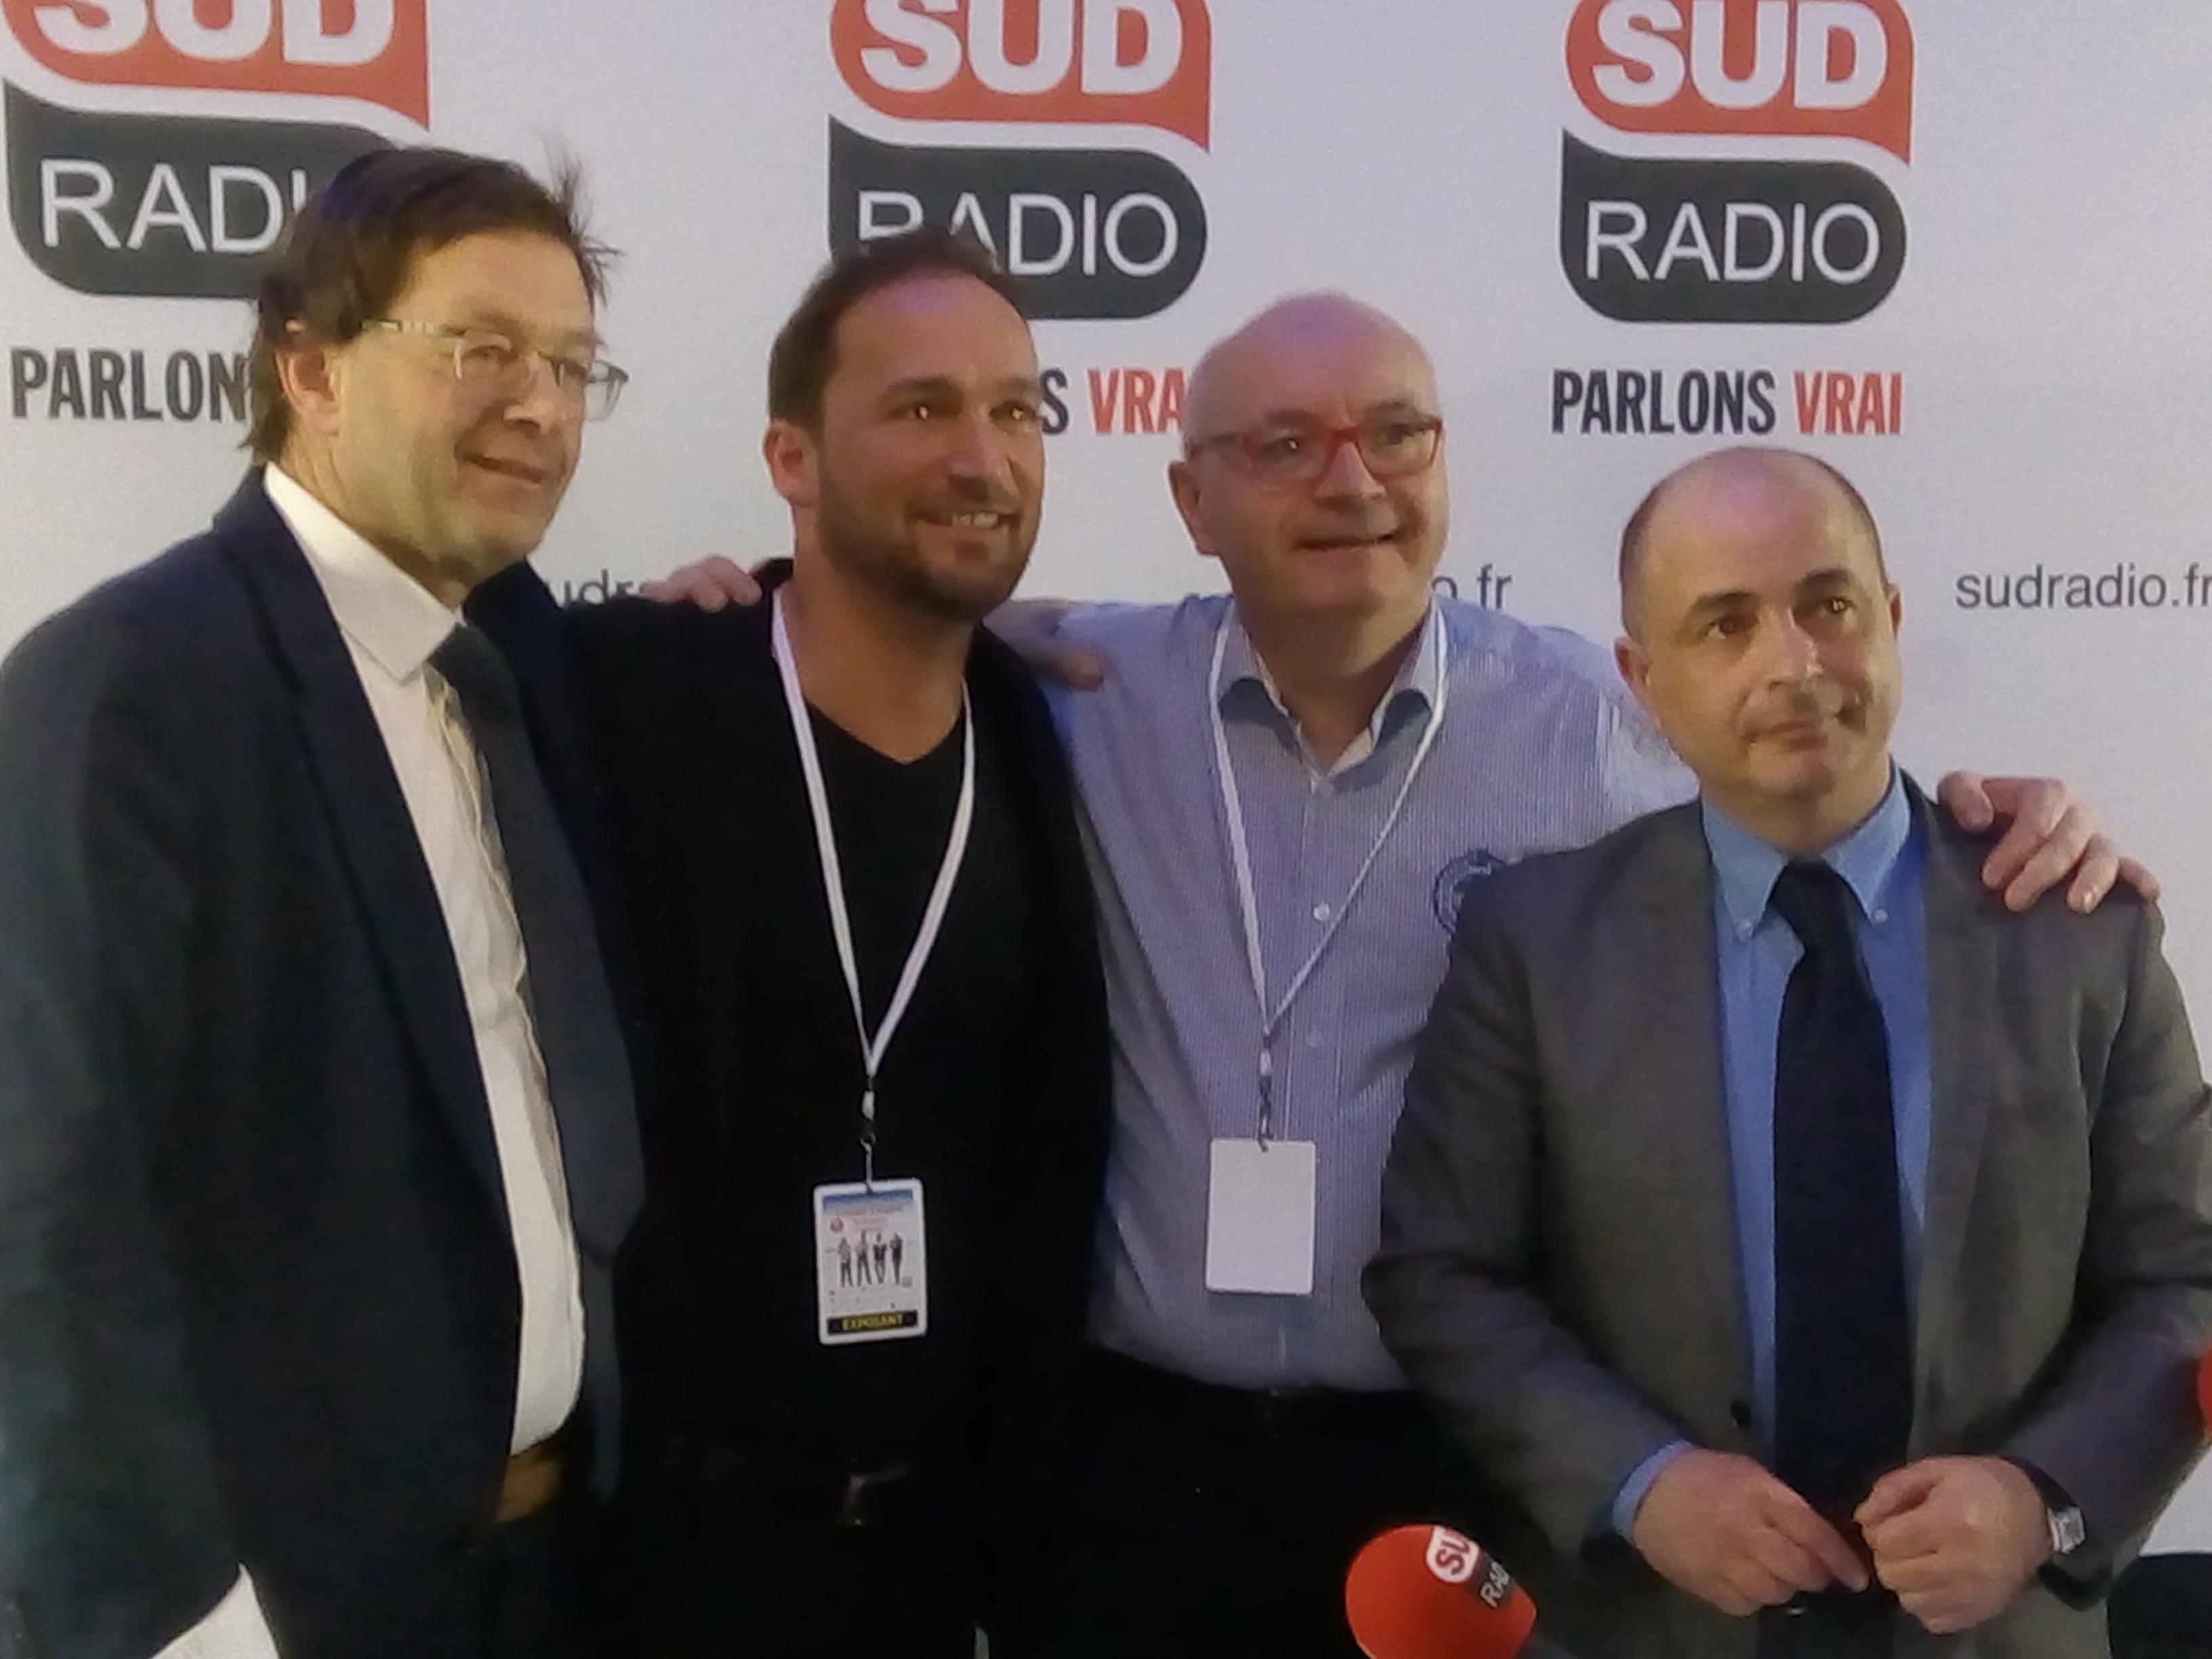 sud radio emission flexi-entrepreneur Daniel Pardo